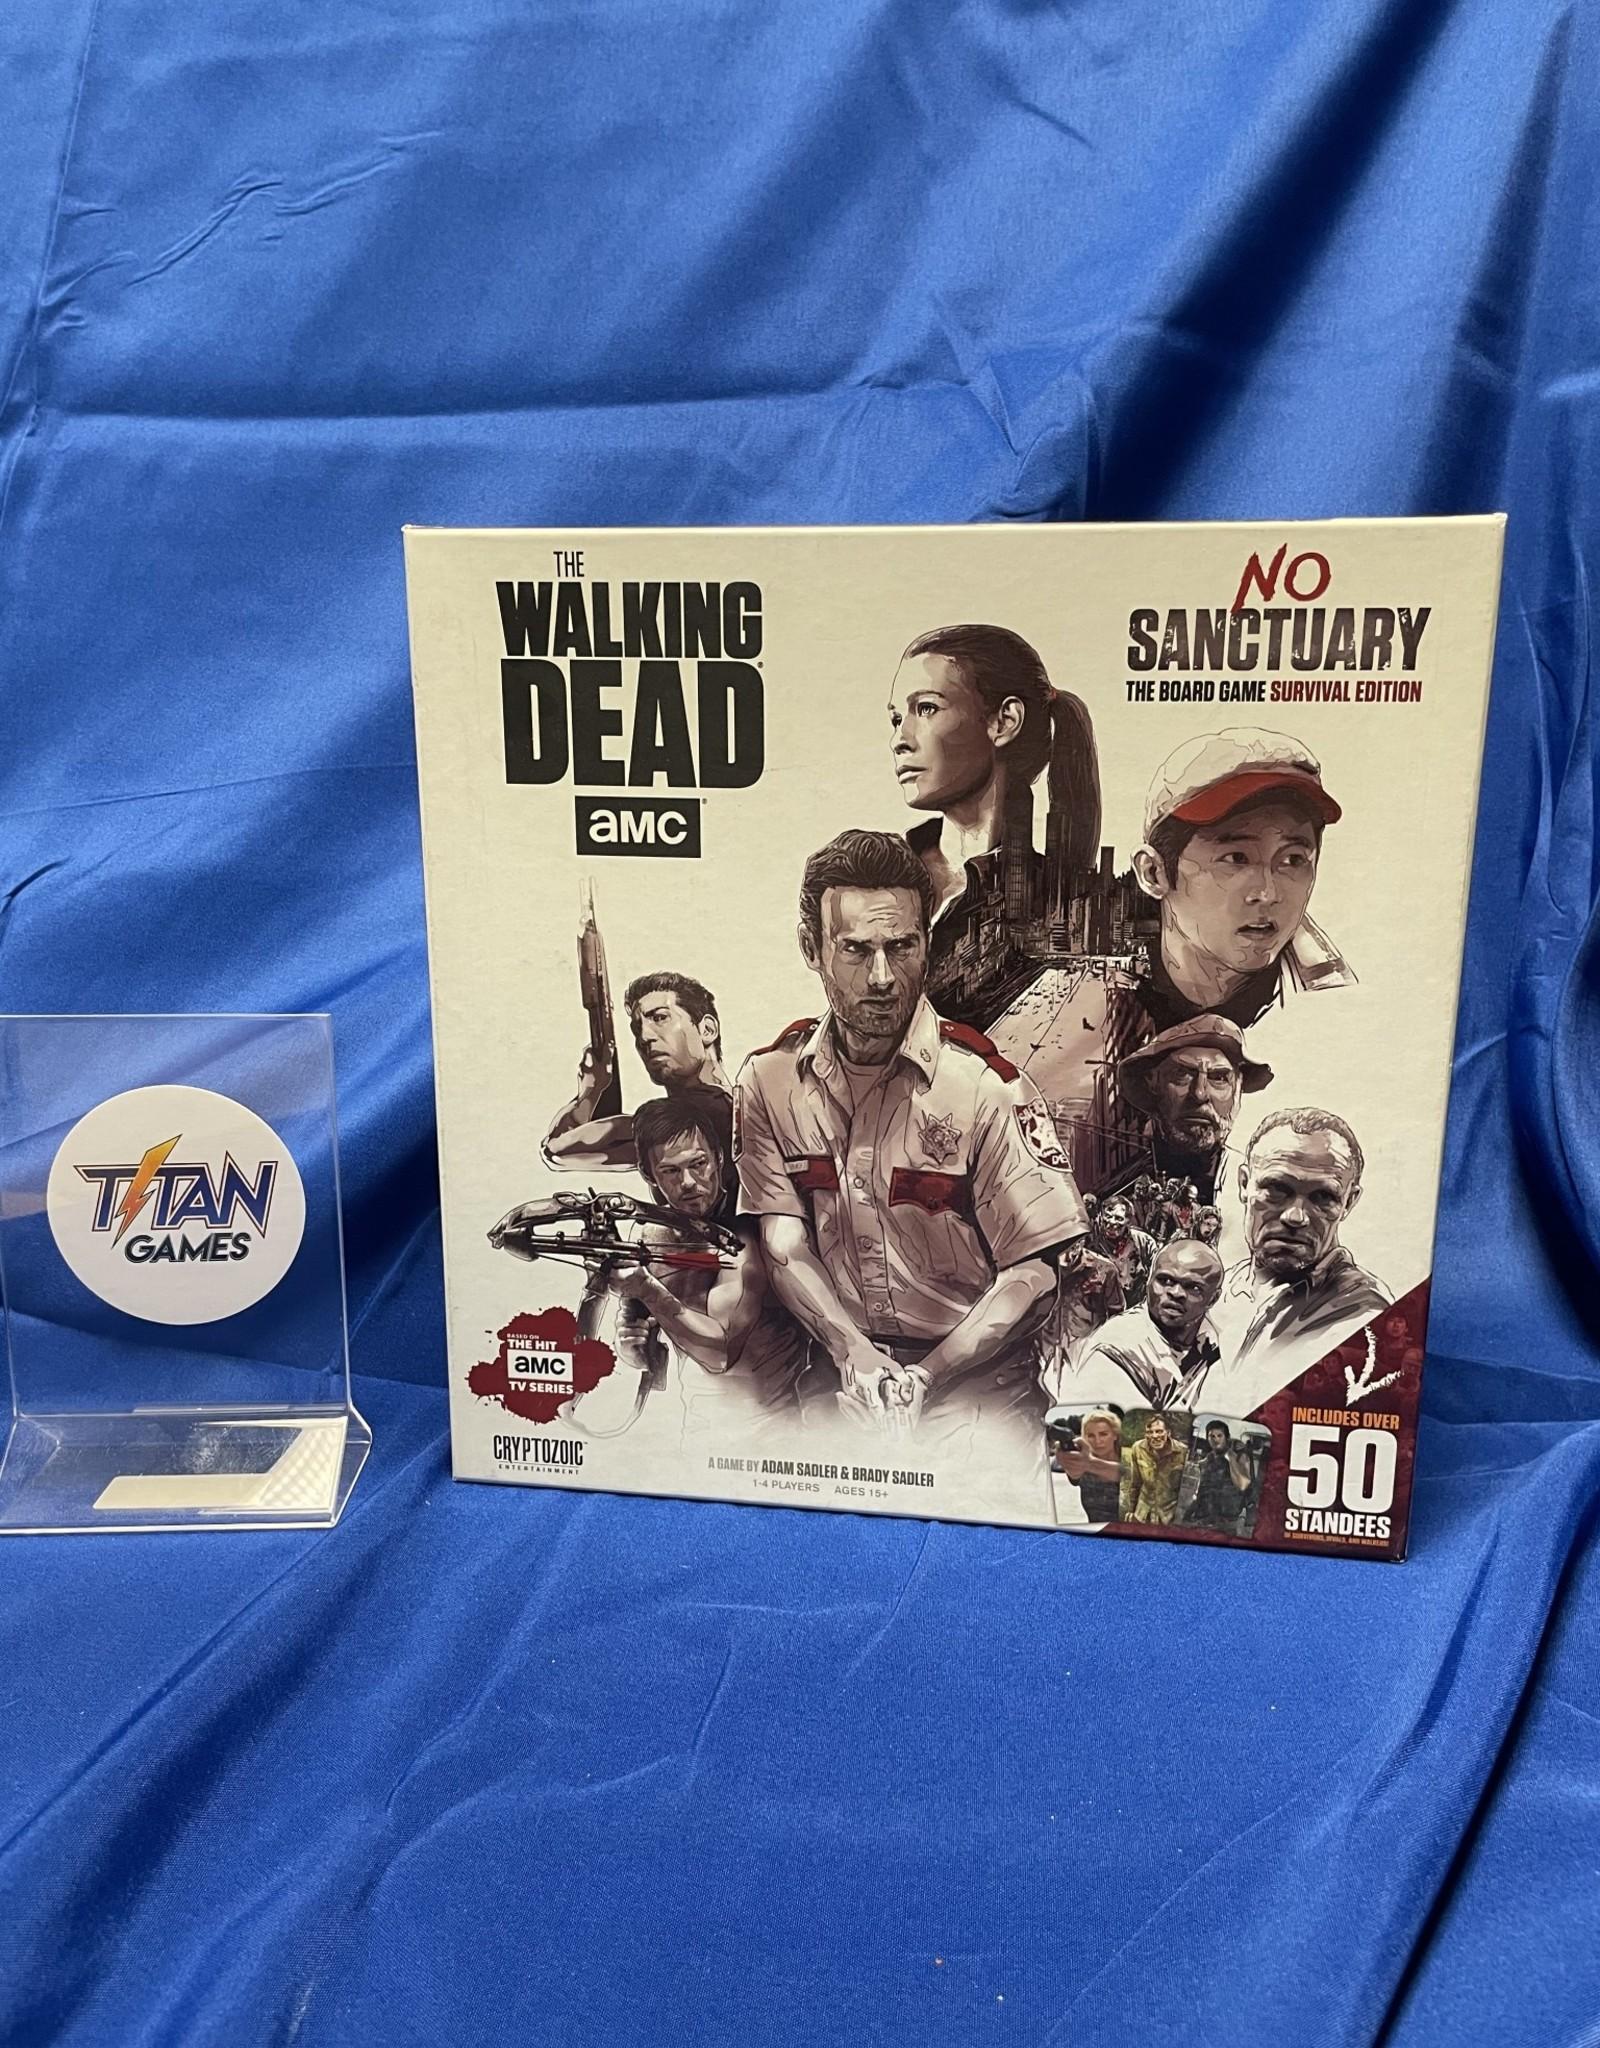 UBGS The Walking Dead: No Sanctuary